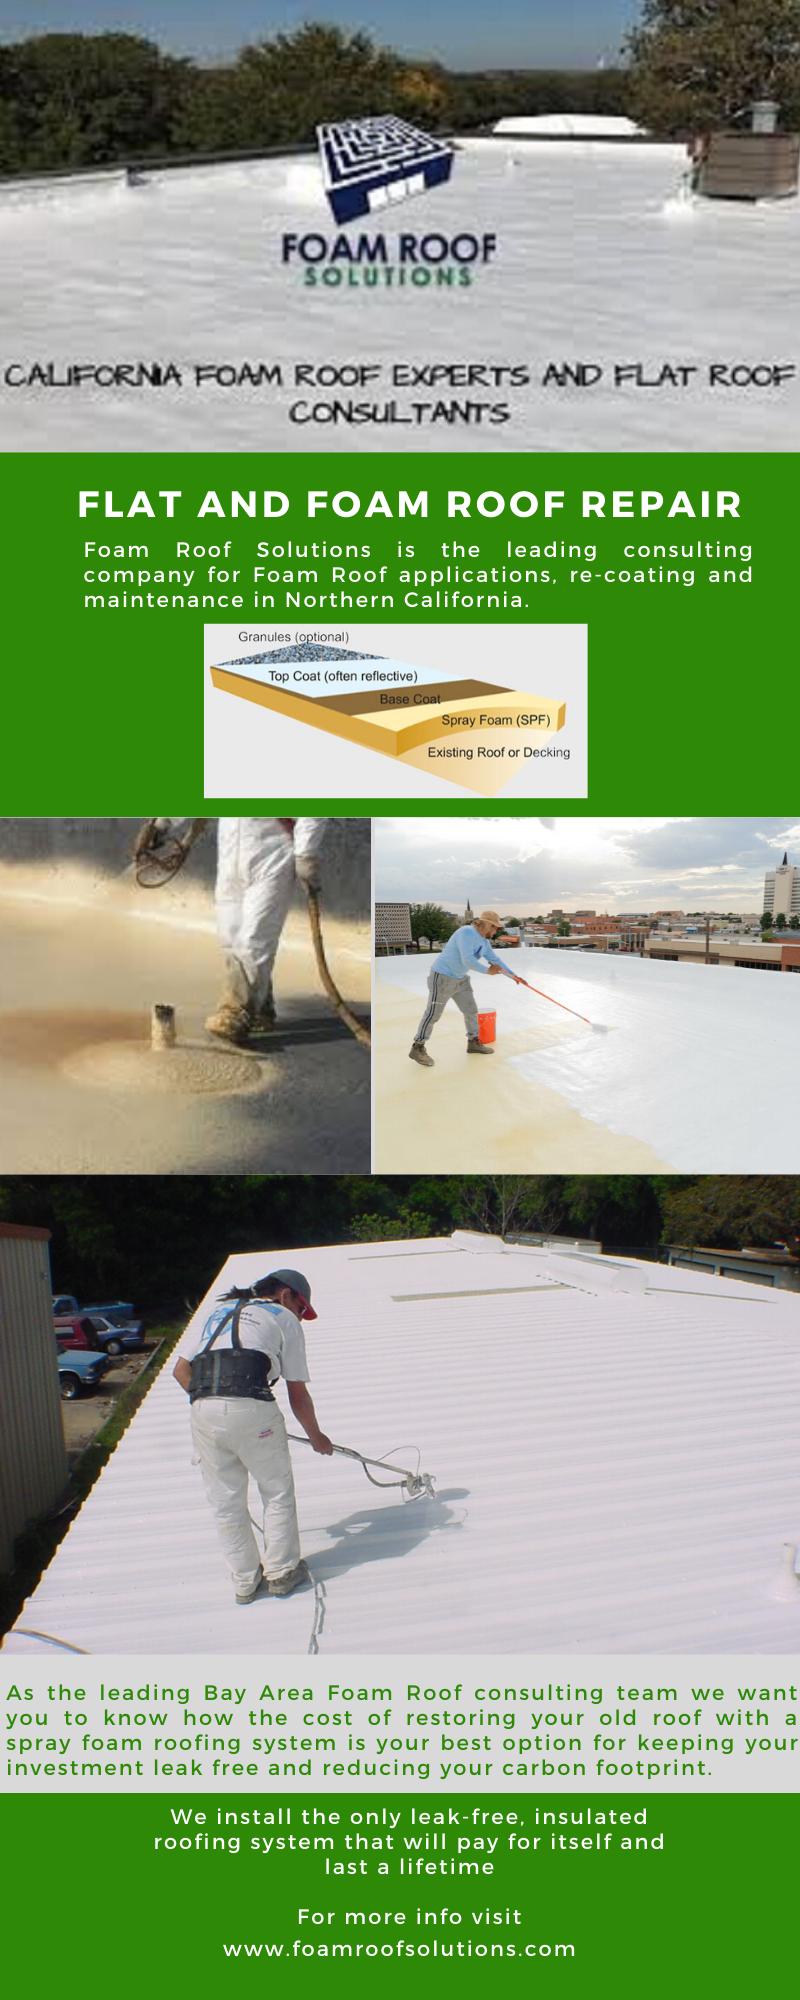 Flat Urethane Roof Repair Sacramento Davis Bay Area Residental Foam In 2020 Roof Repair Foam Roofing Flat Roof Repair